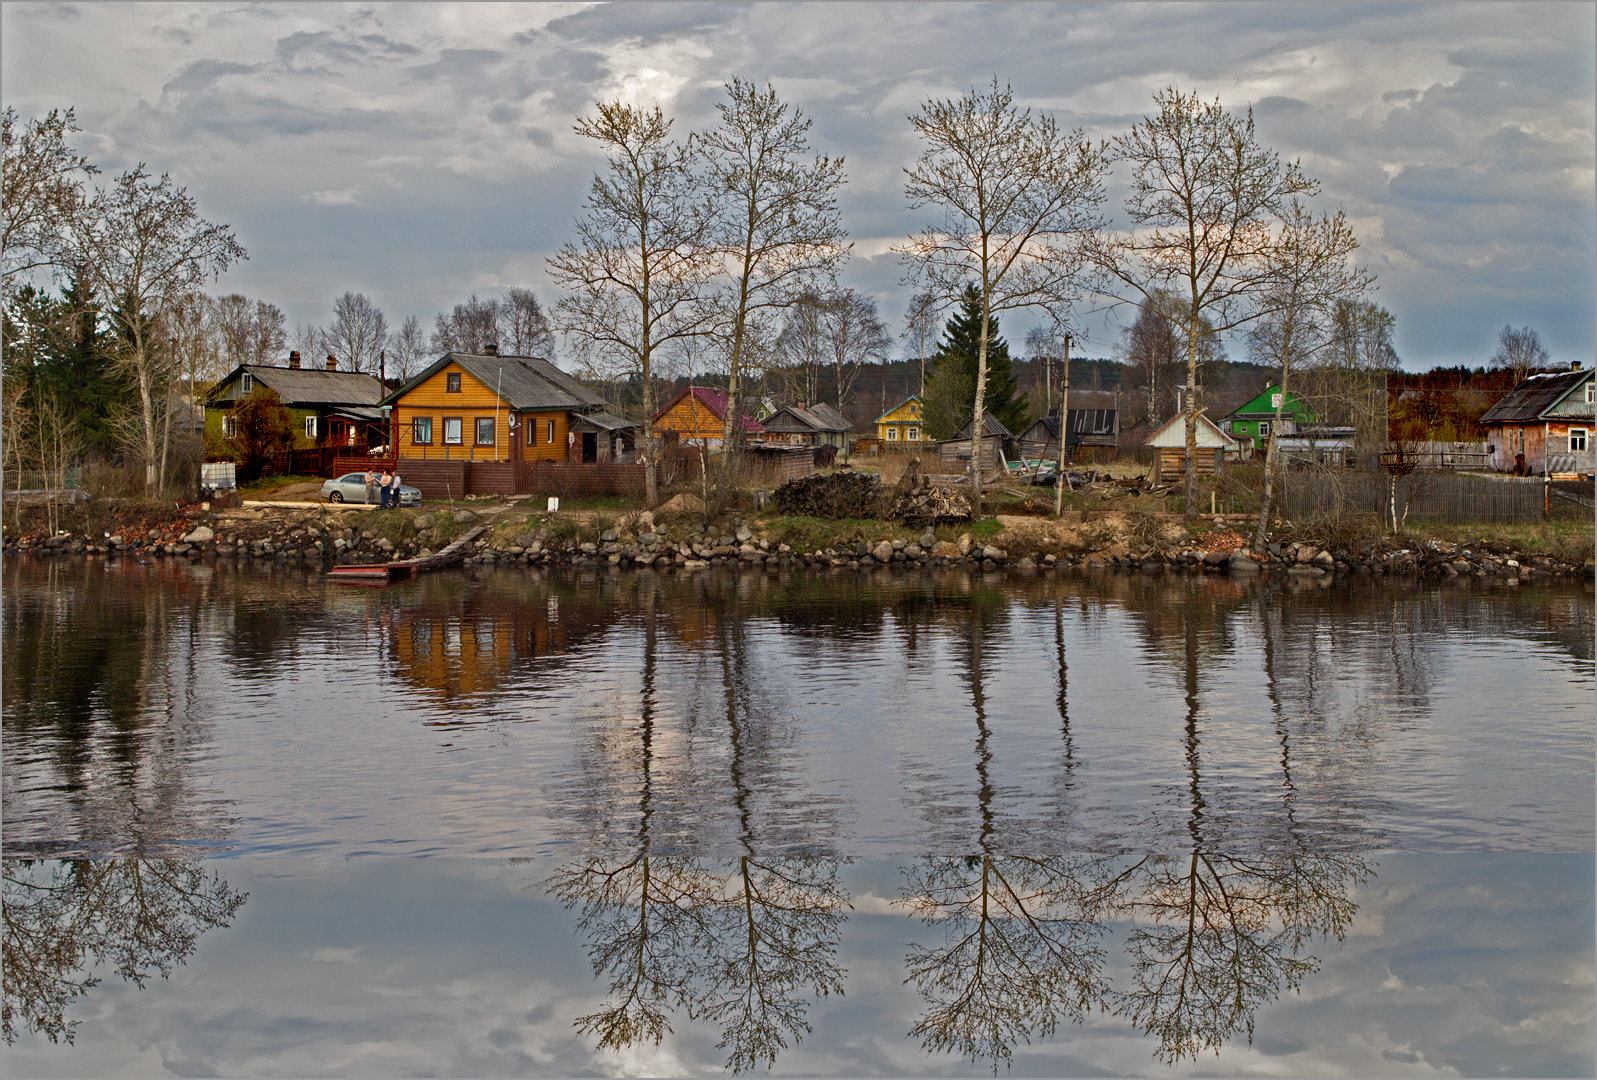 Reflections on the Volga